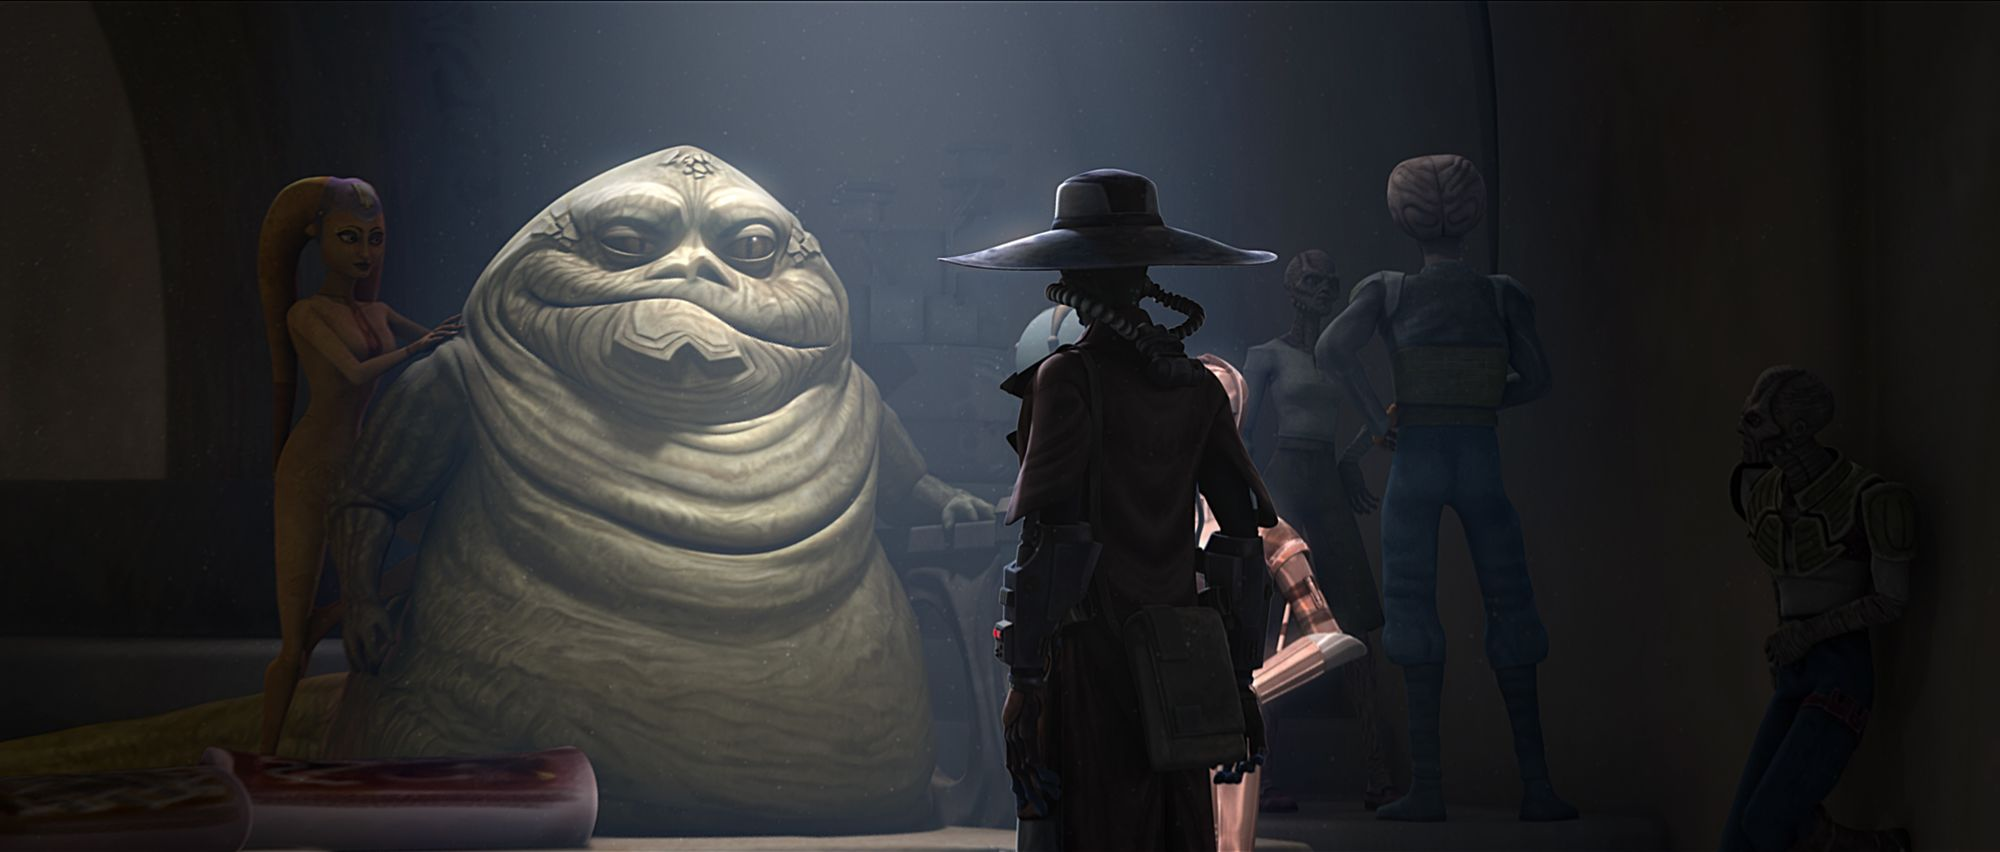 Jabba-the-hut.jpg